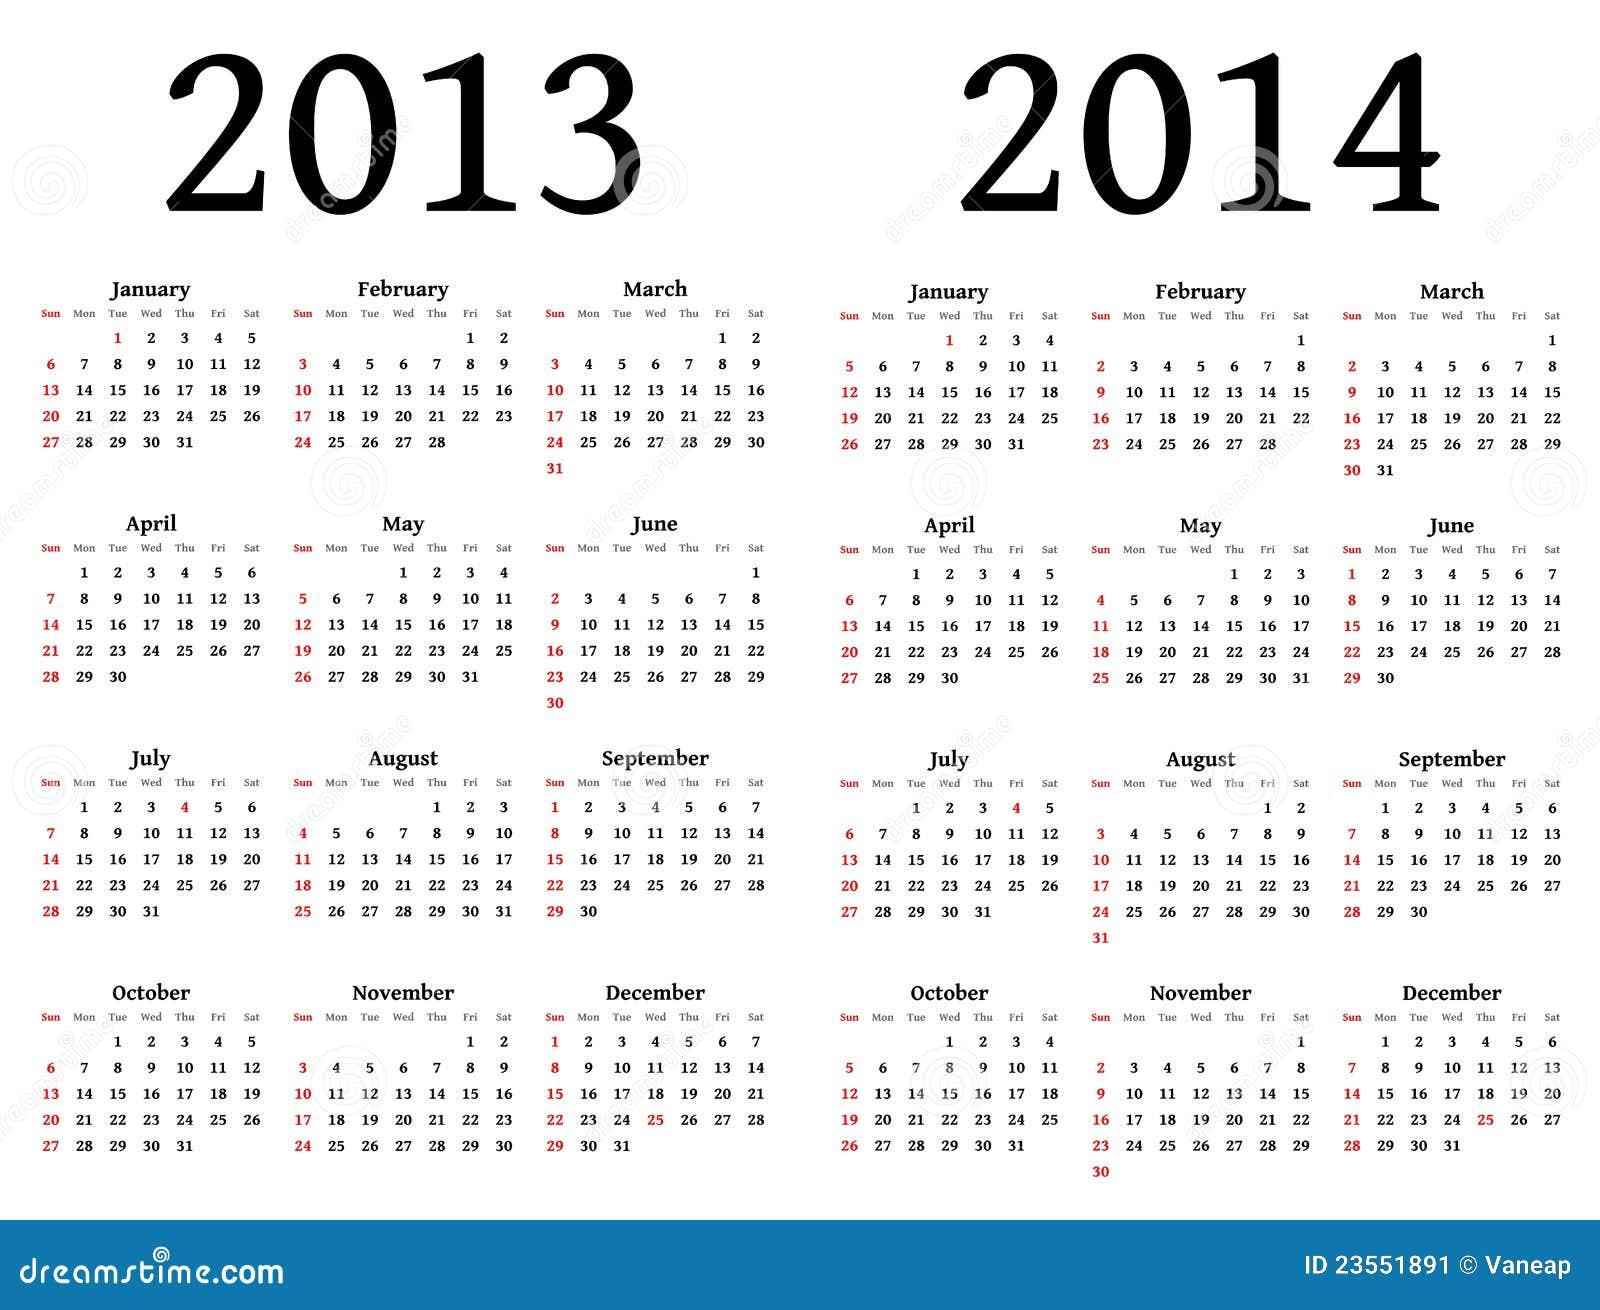 Calend  Rios Para 2013 E 2014  Para Para Ser Usado Por Desenhadores